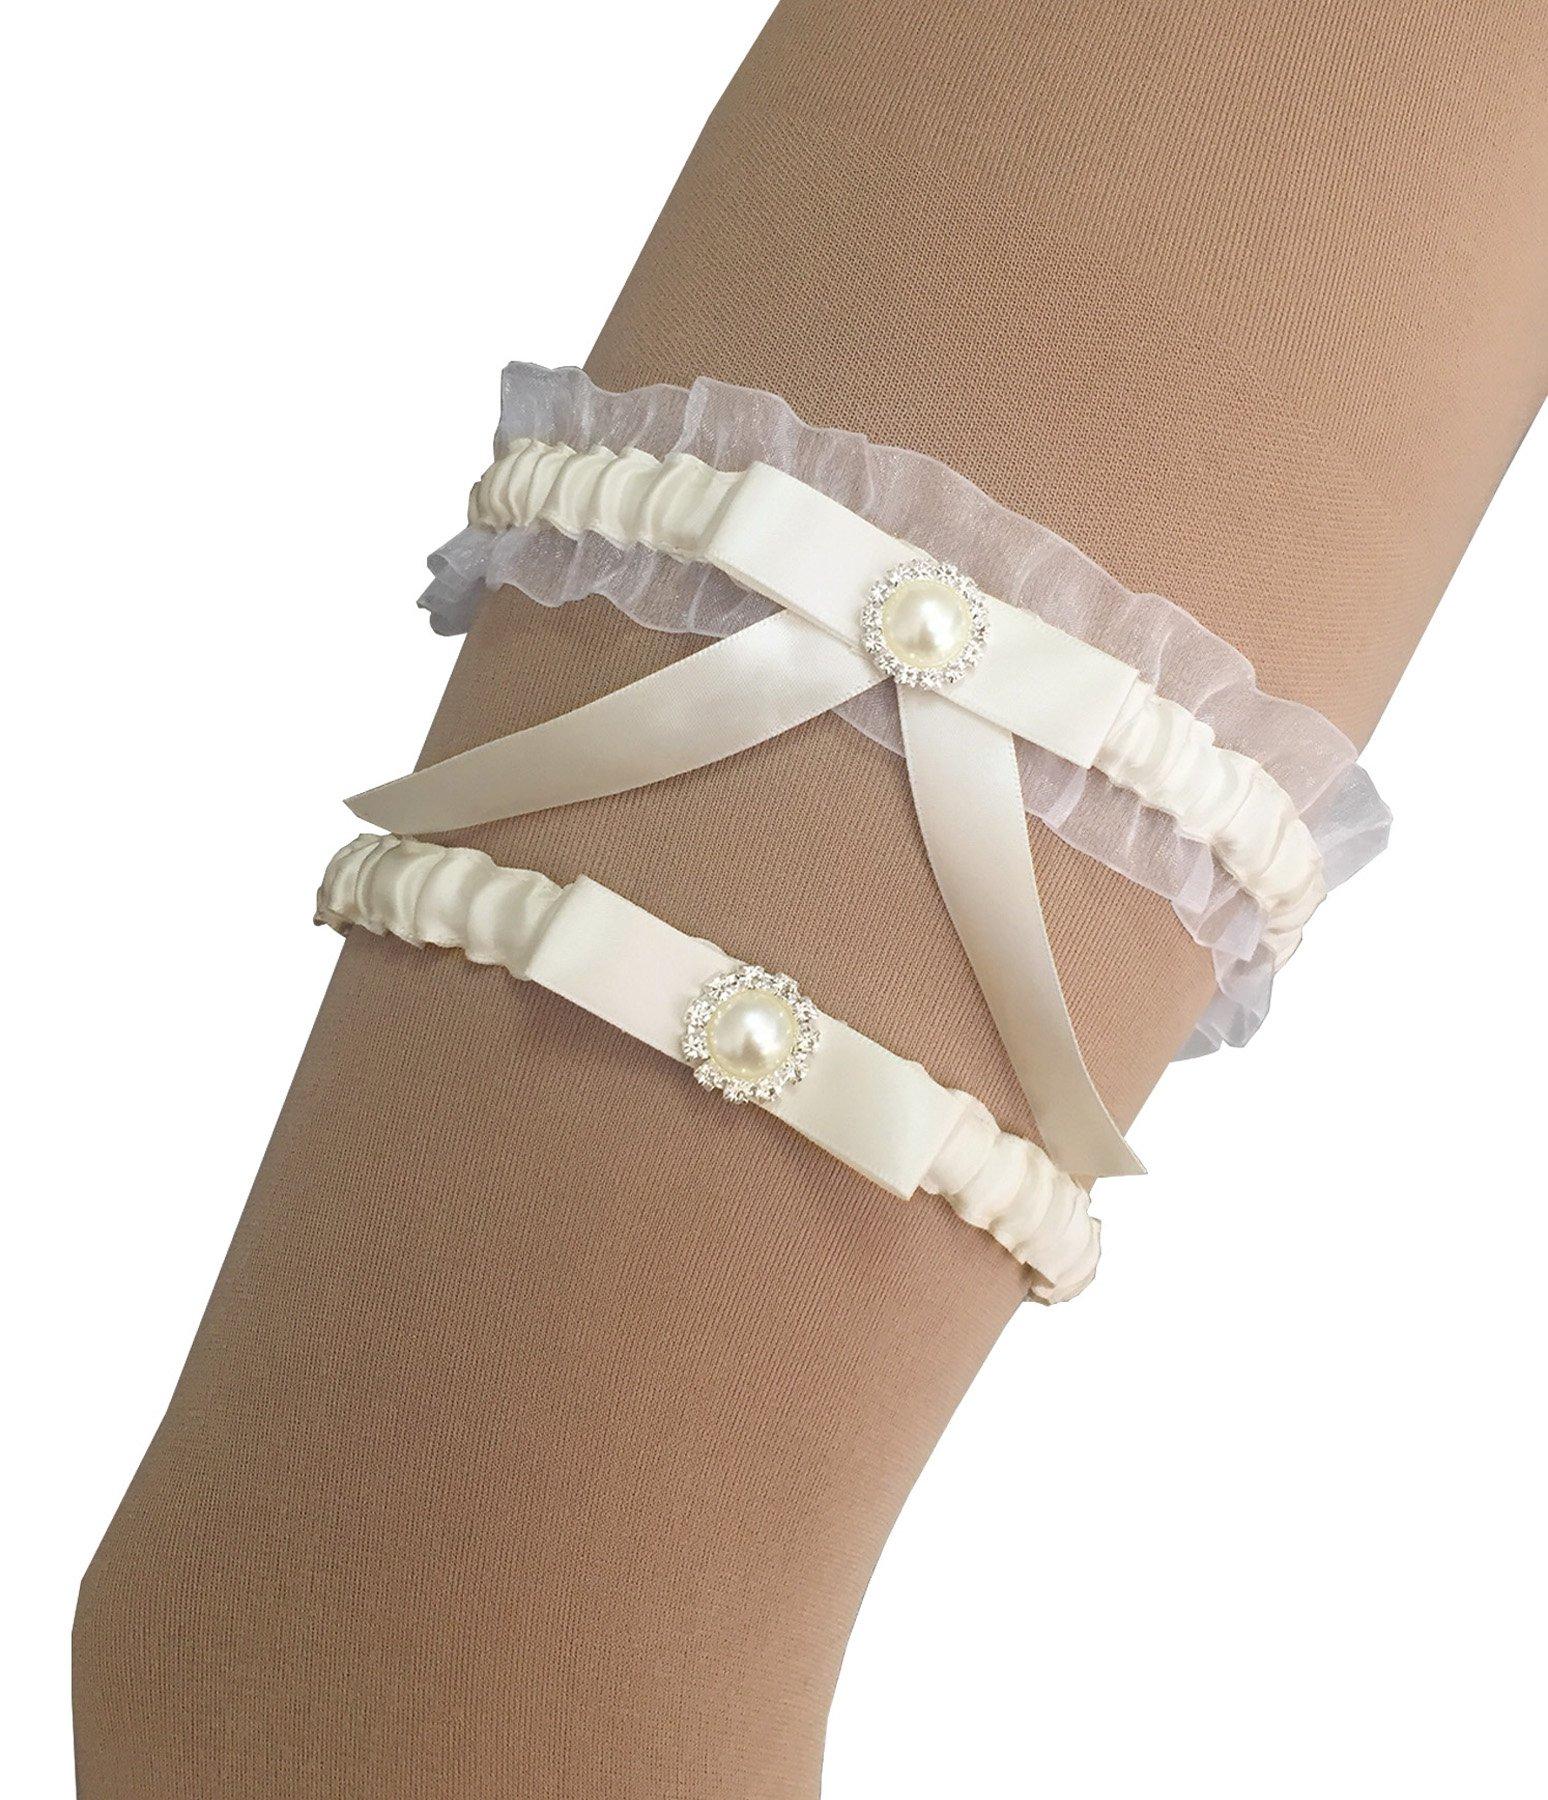 Kirmoo Bridal Garter Belt Set Ivory Wedding Keepsake and Toss Garters For Bride (One Size Fit Most,15''~23'')